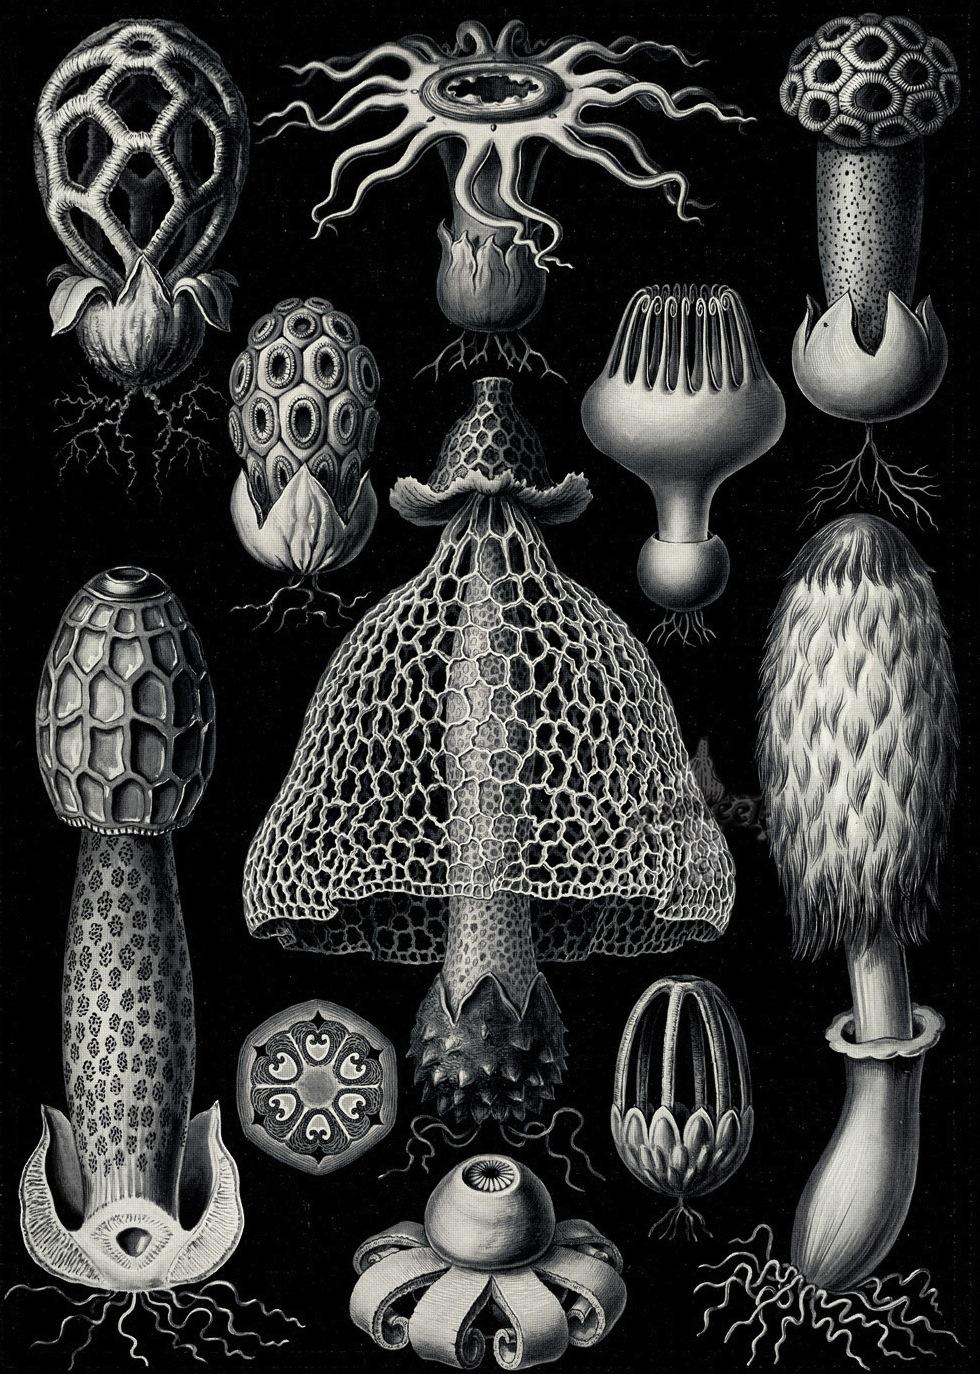 Ernst Haeckel. Hexacoralla, Ascomycetes, Lichenes, Phaeodaria.